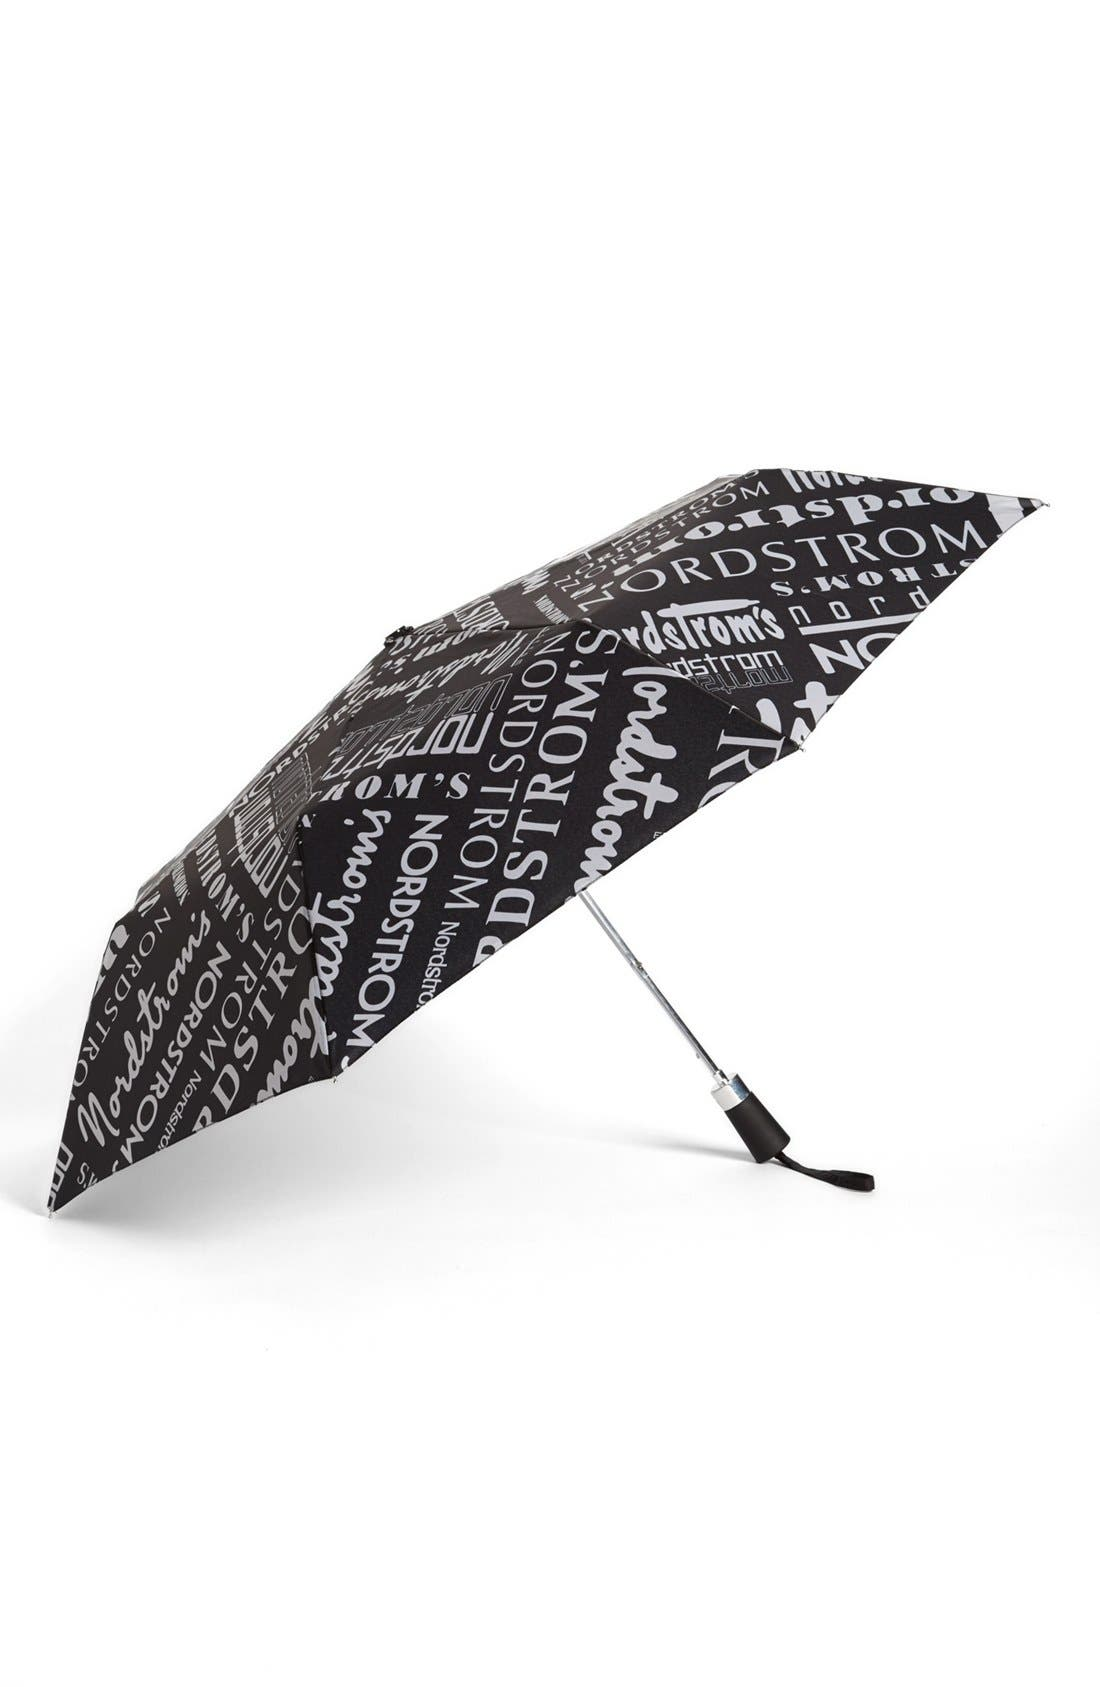 Alternate Image 1 Selected - Nordstrom 'Heritage' Umbrella